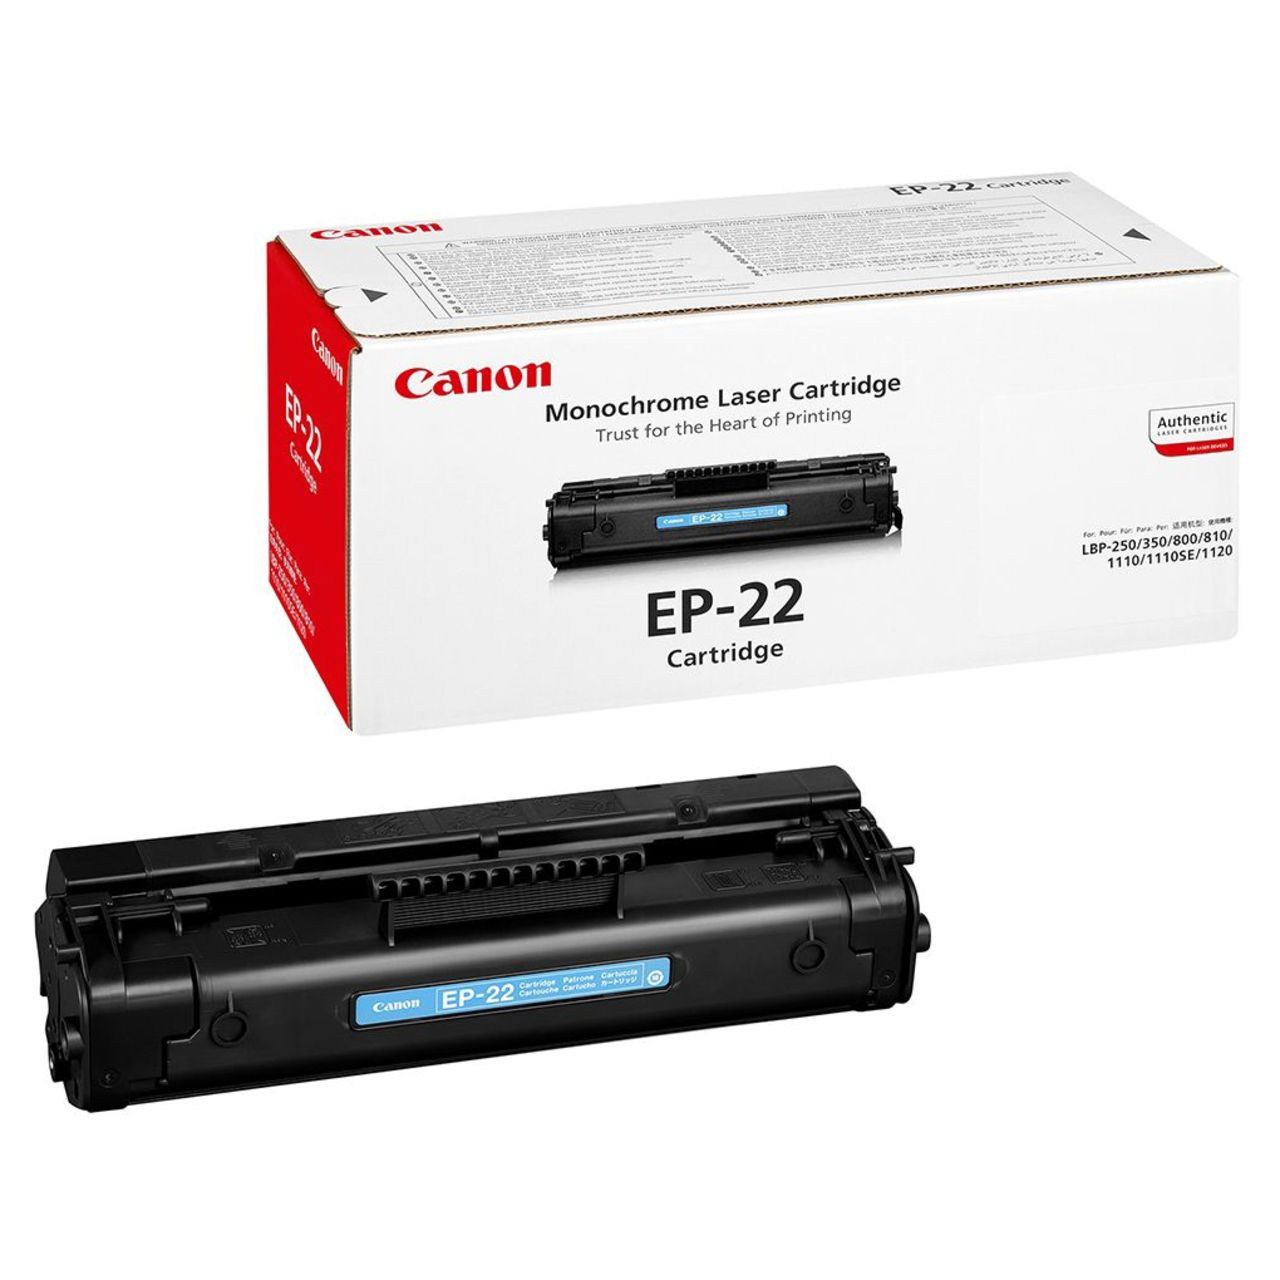 Заправка картриджа Cartridge EP-22 для Canon Laser Shot LBP-800